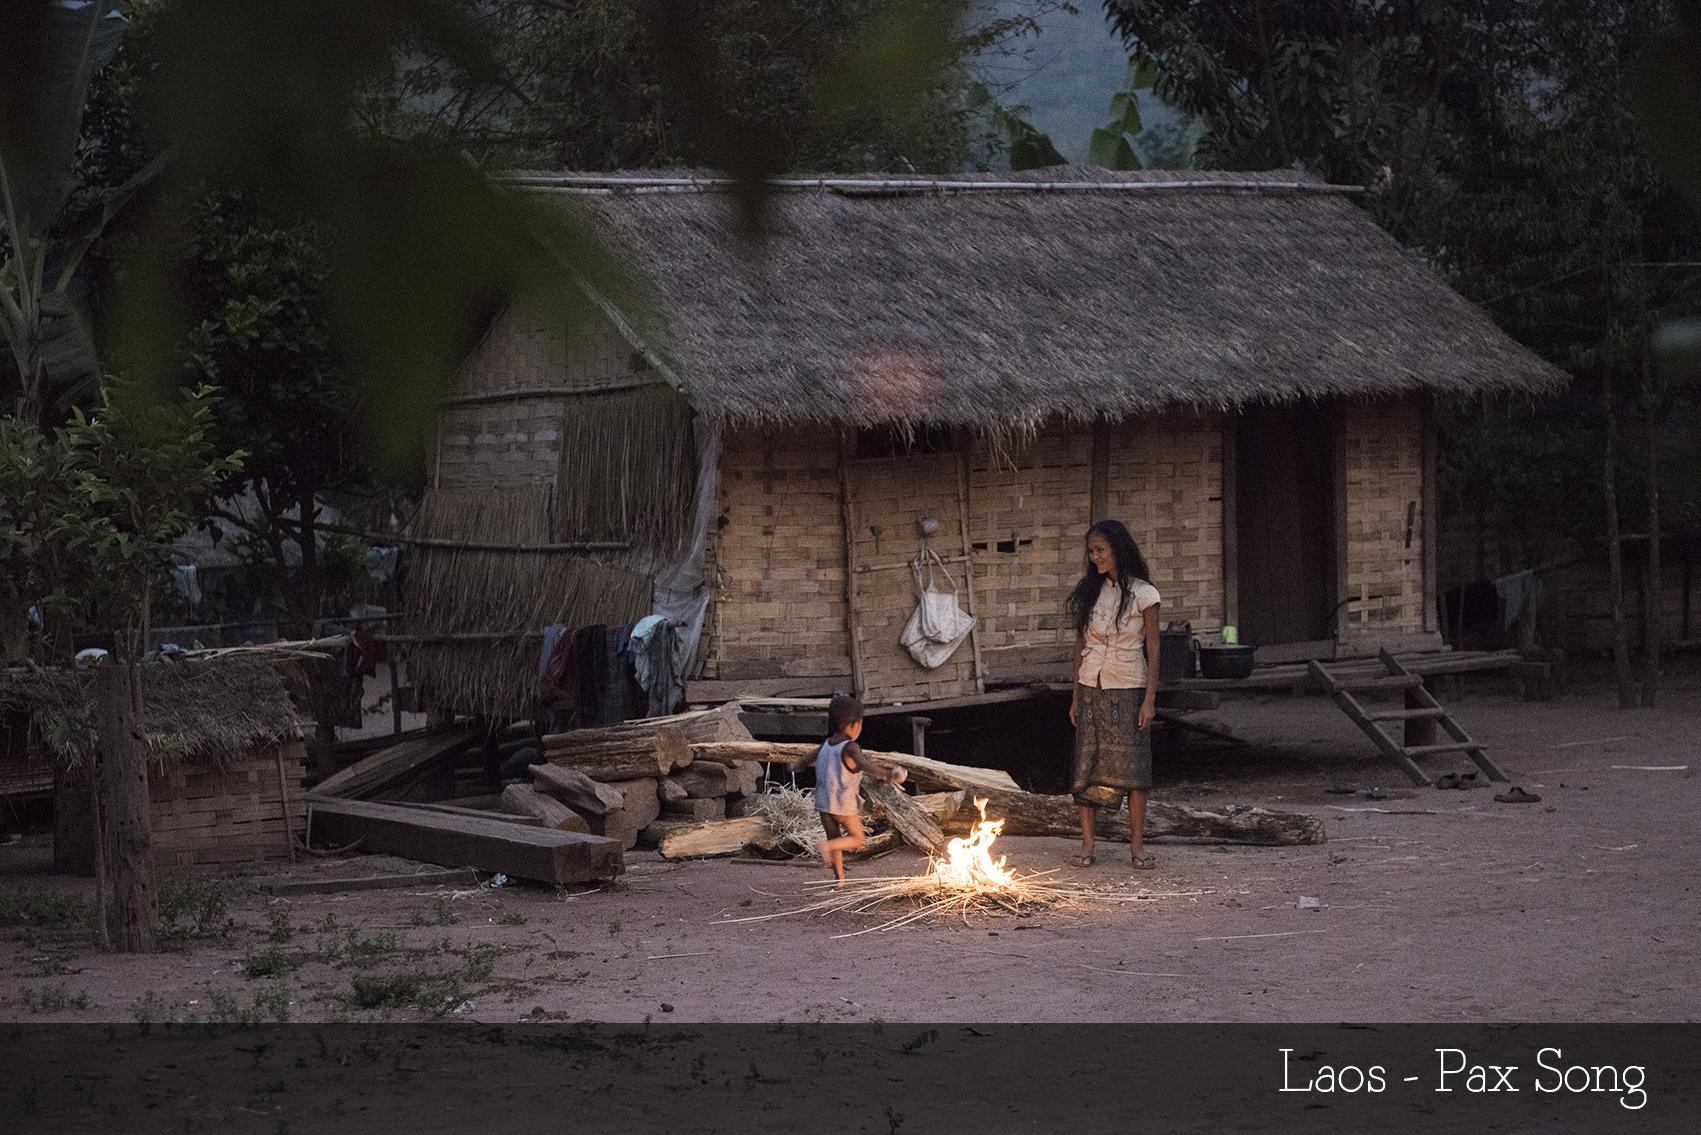 Laos - Pax Song.jpg